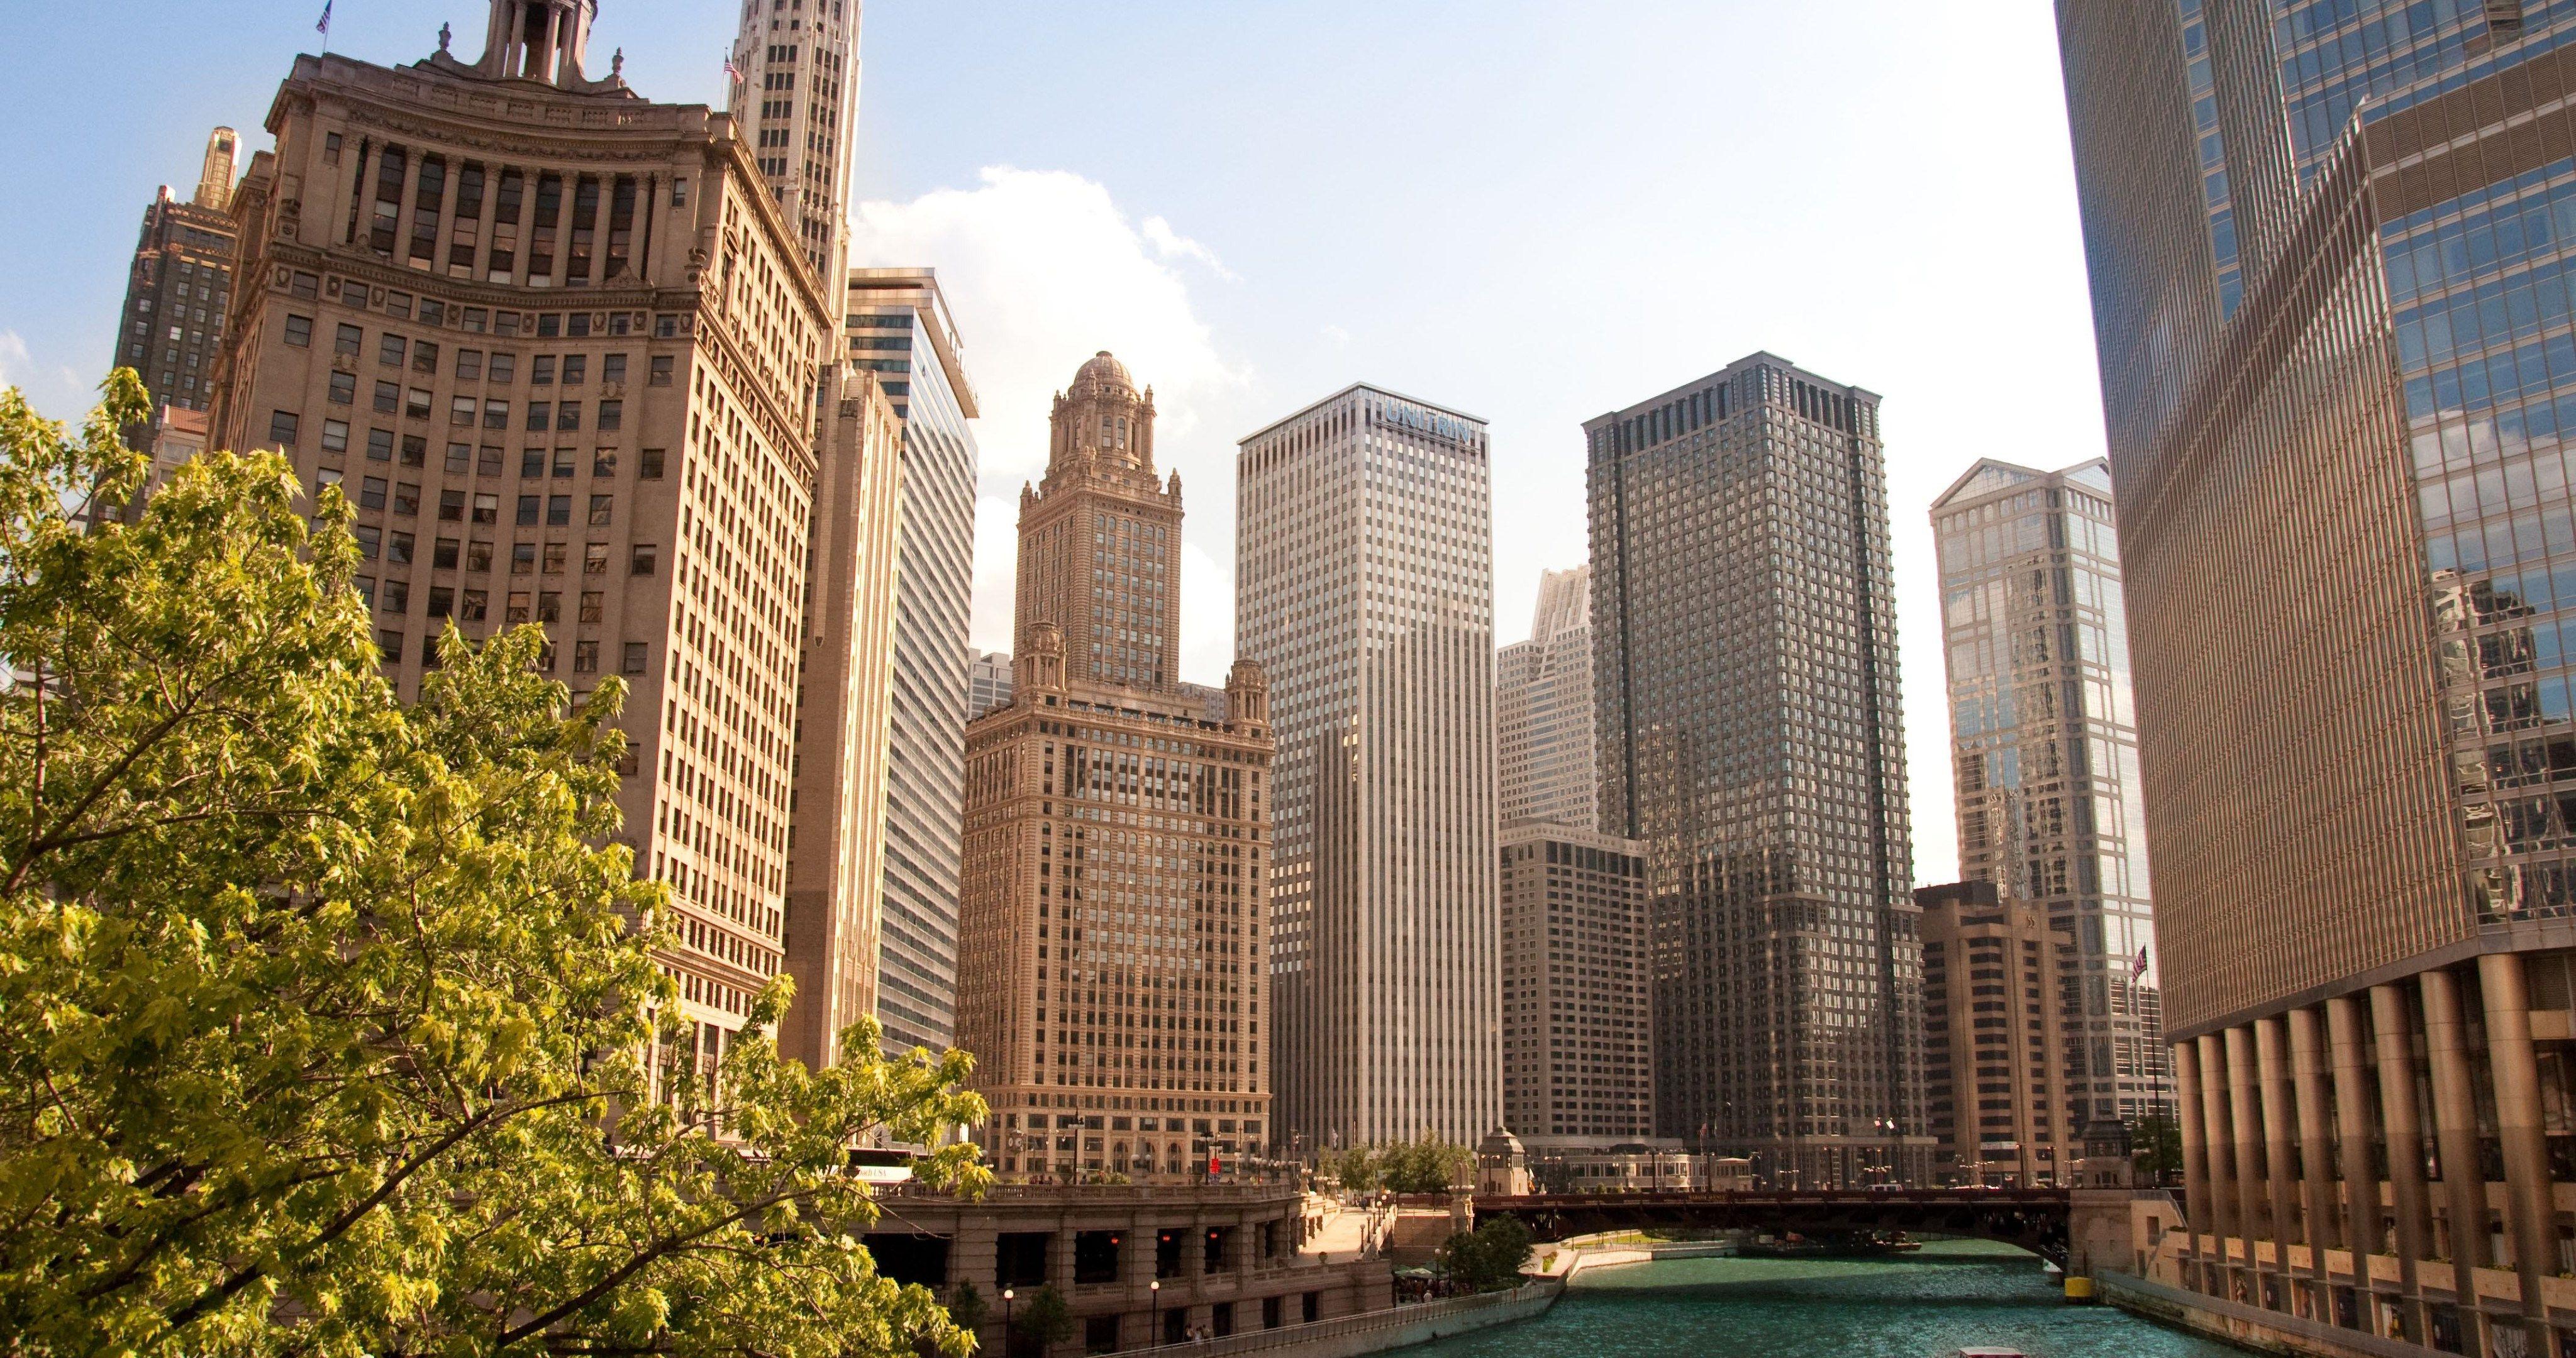 Usa Illinois 4k Ultra Hd Wallpaper Chicago City City Chicago